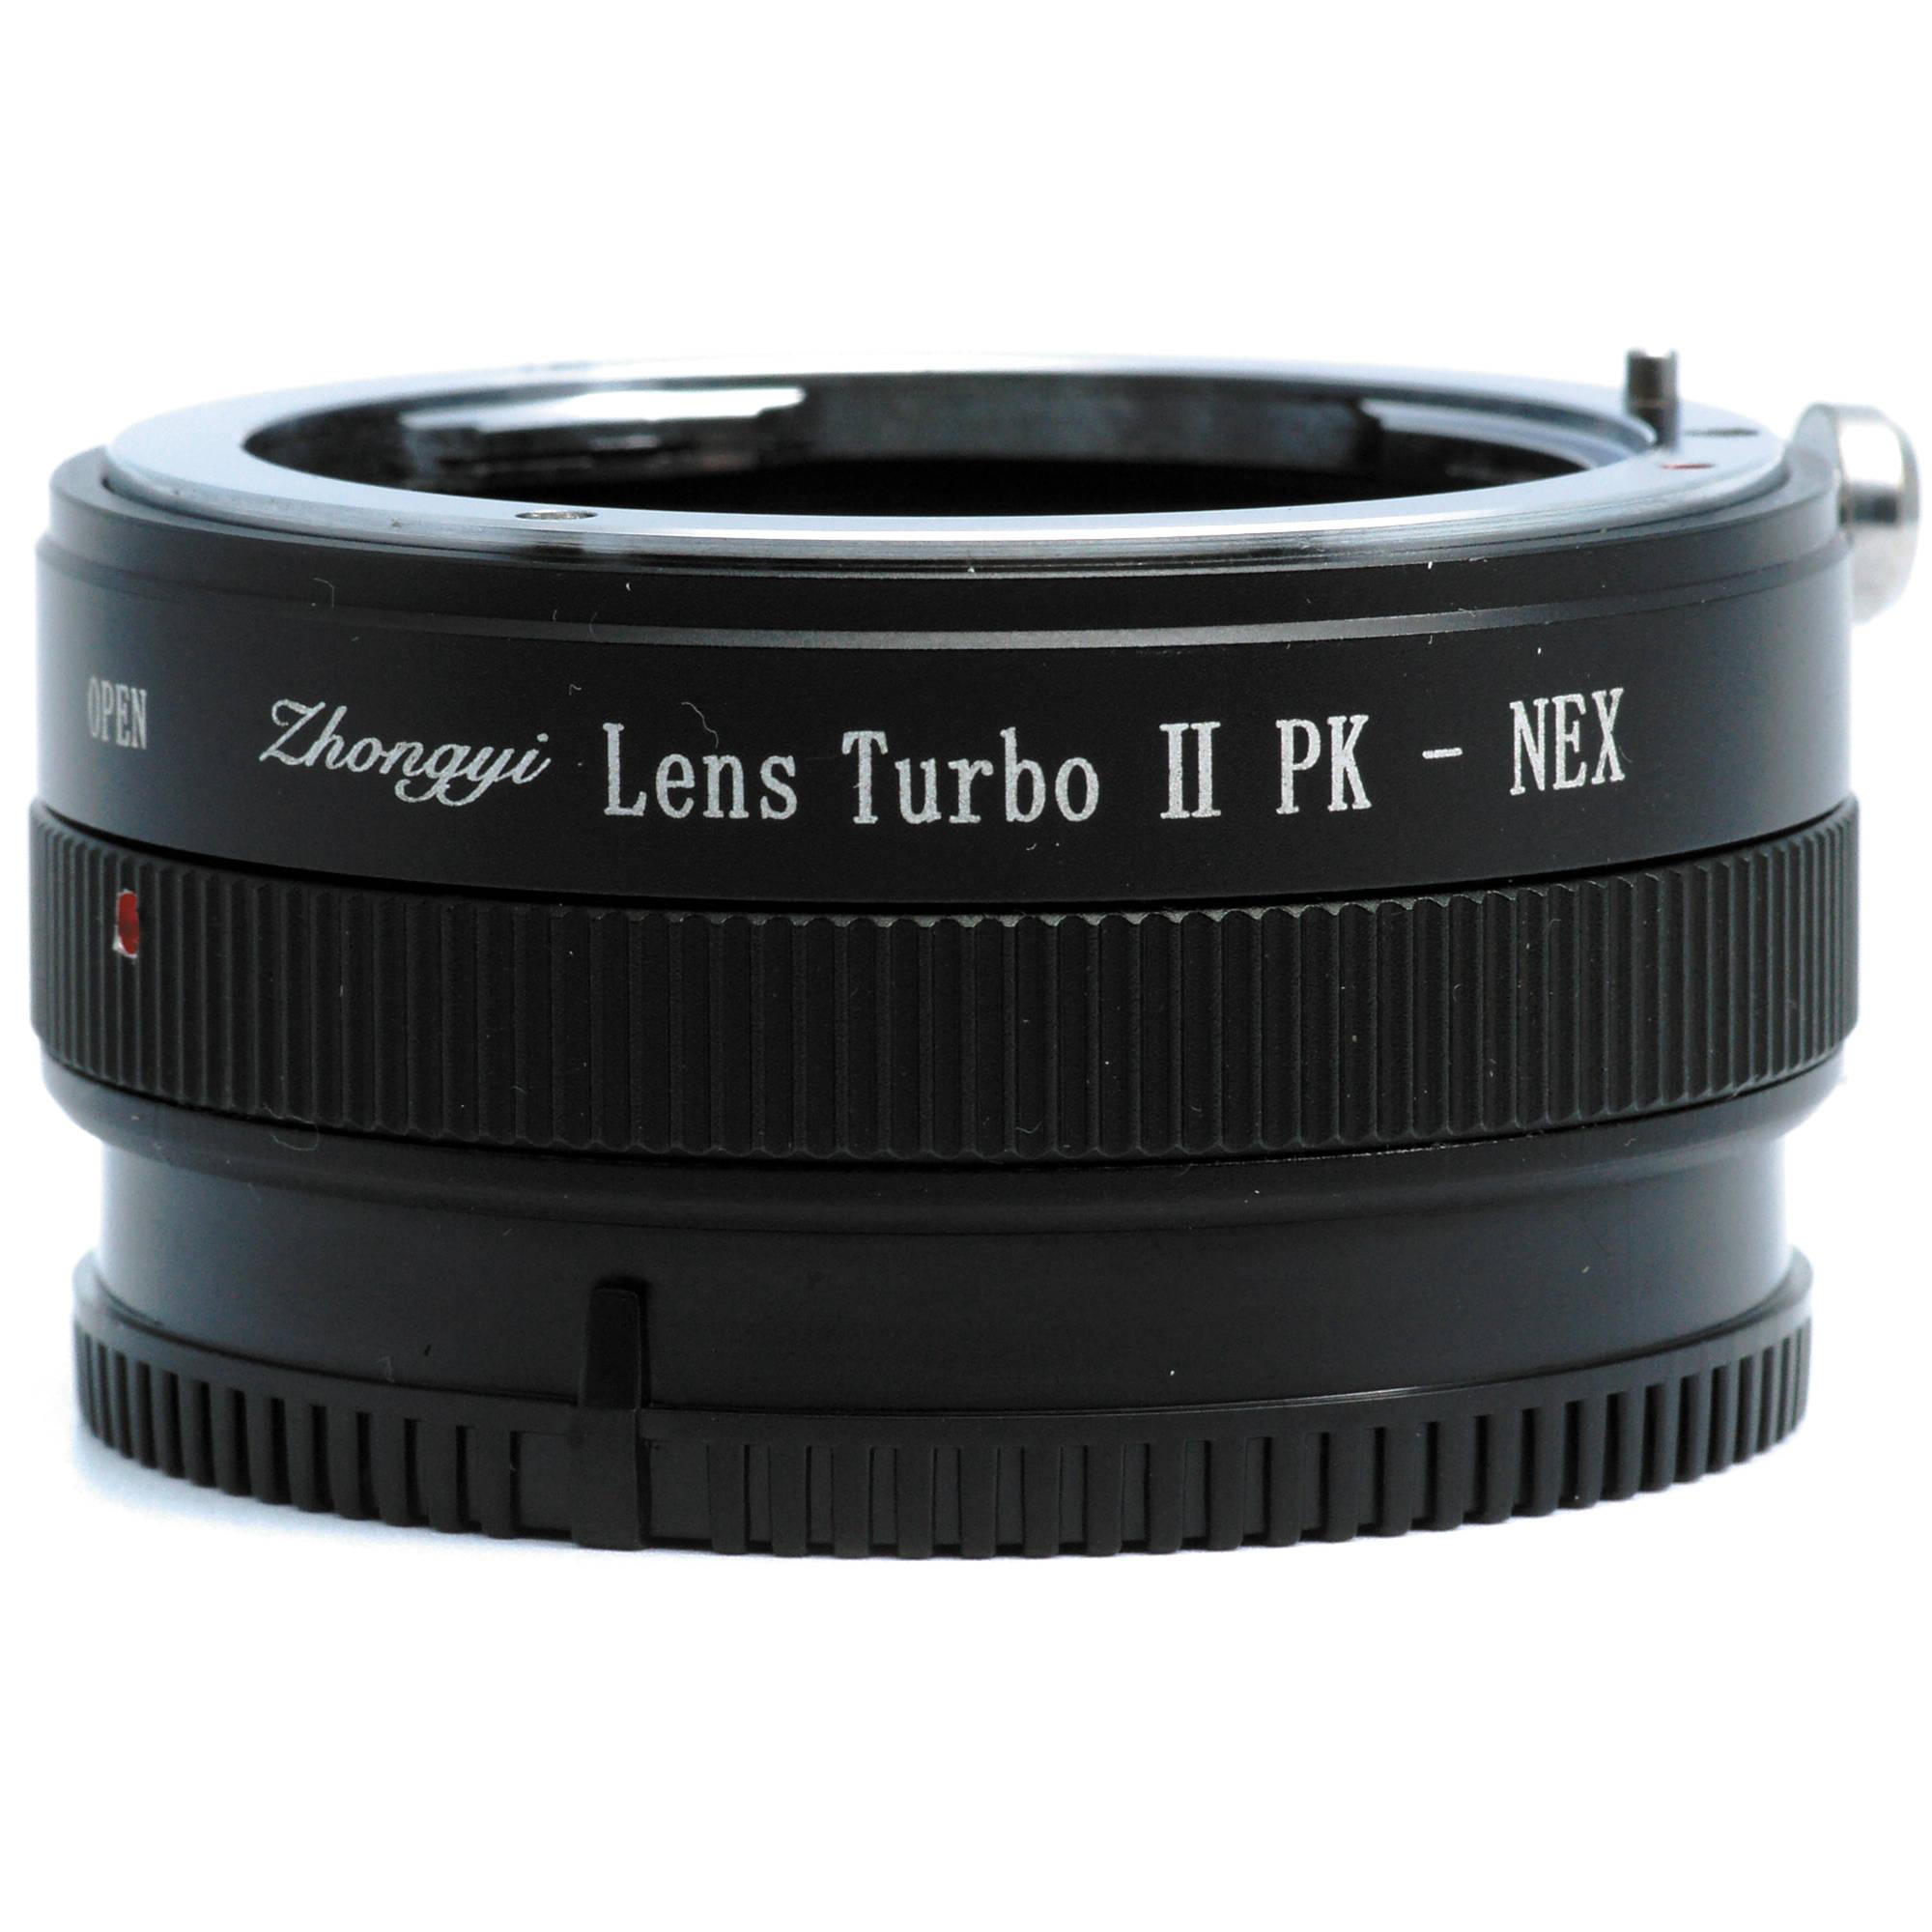 Mitakon Zhongyi Pentax K Lens To Sony E Mount Camera